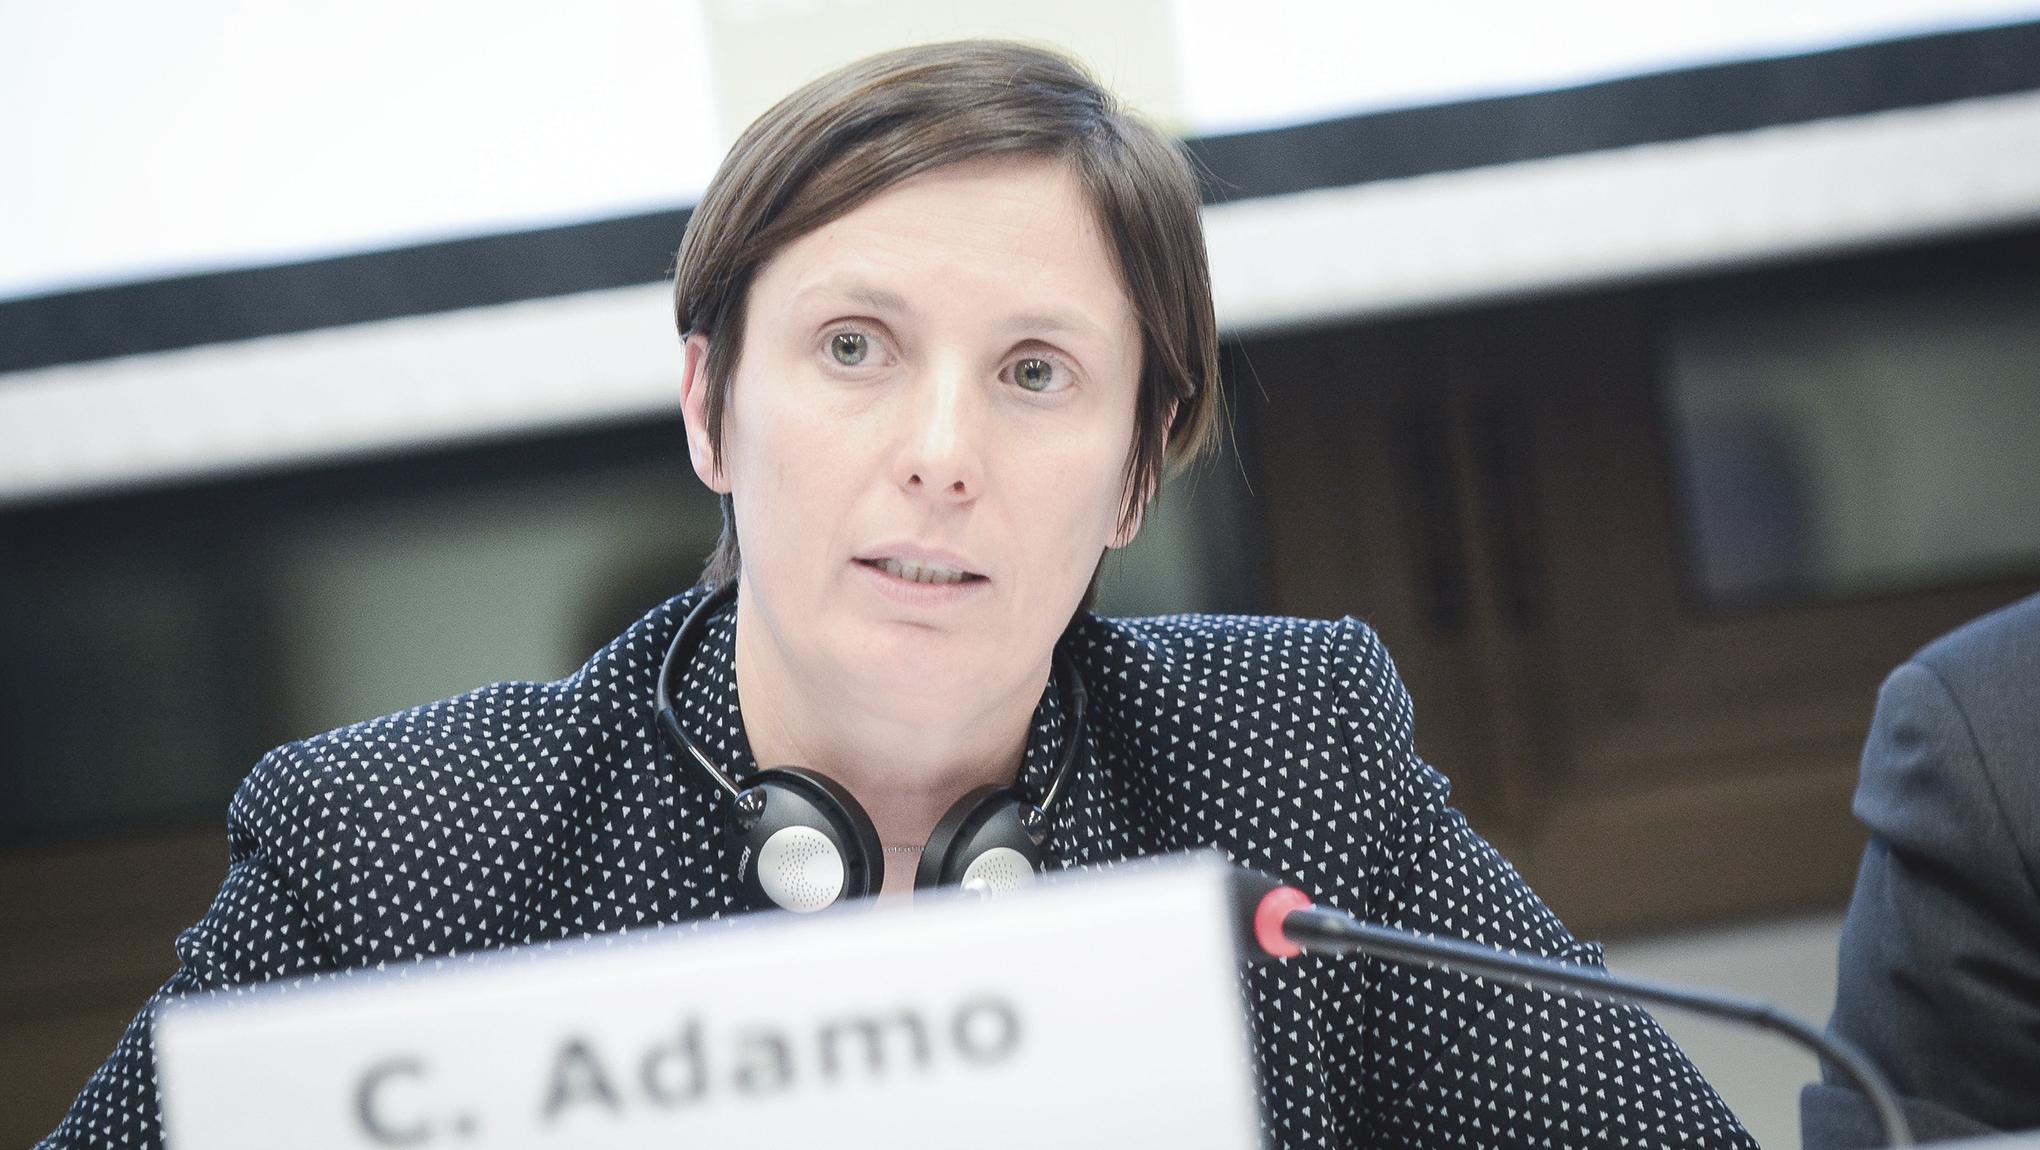 Interview with Chiara Adamo during the European Development Days